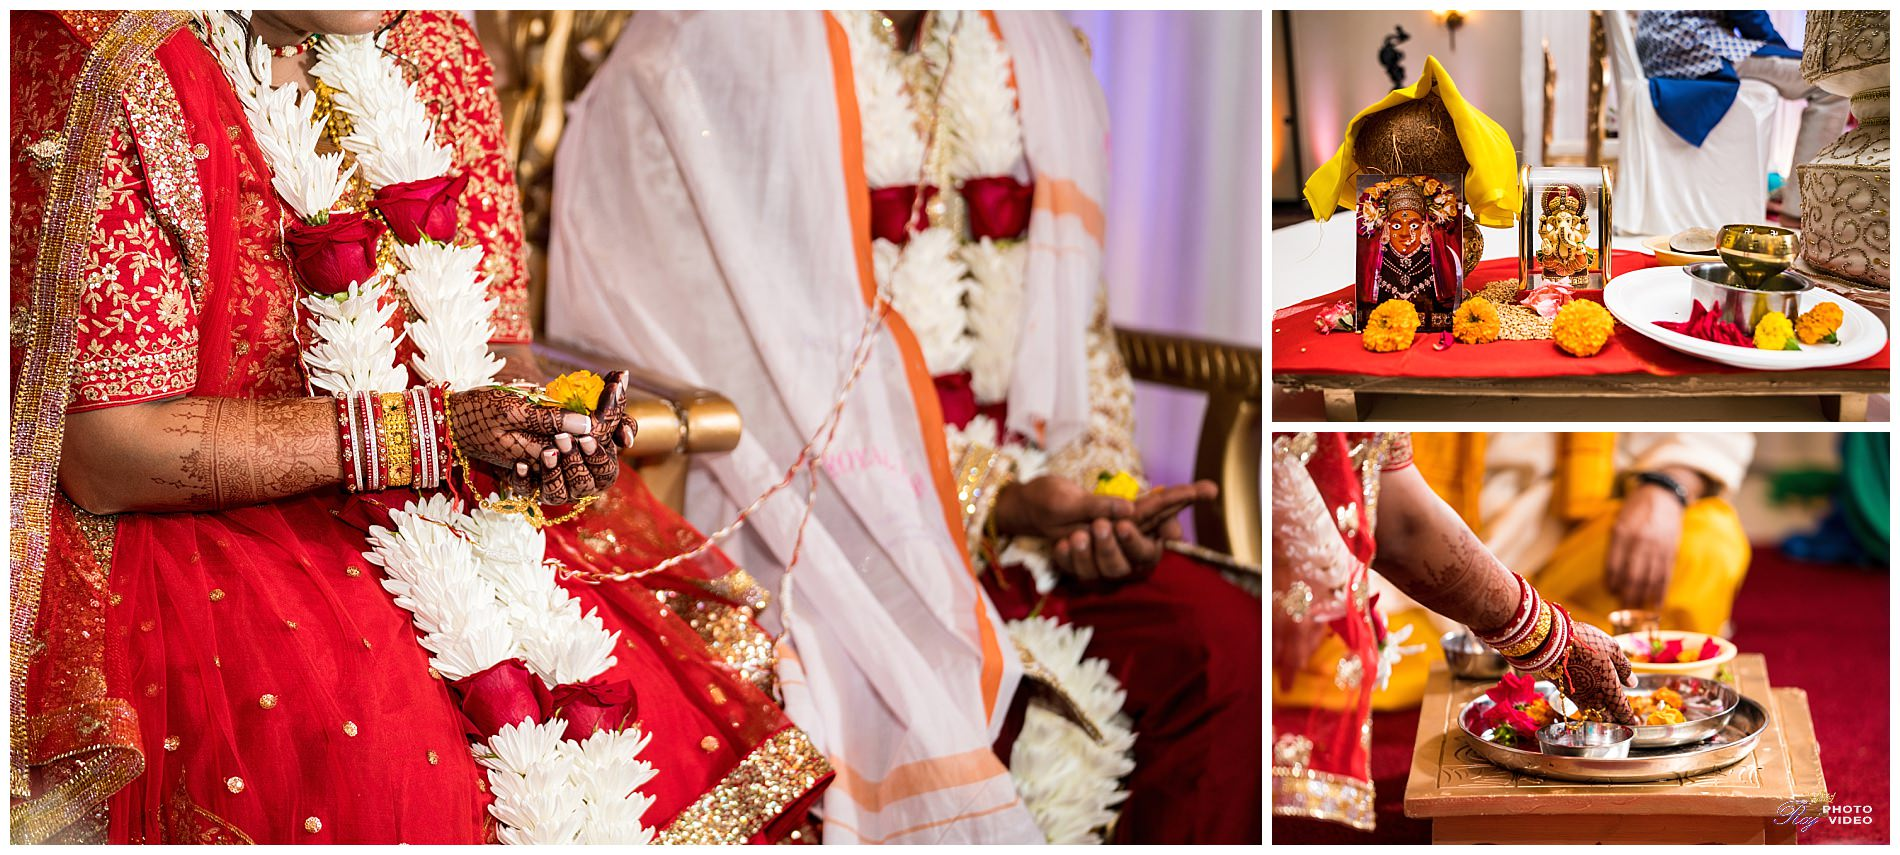 doubletree-by-hilton-hotel-wilmington-de-wedding-krishna-ritesh-61.jpg